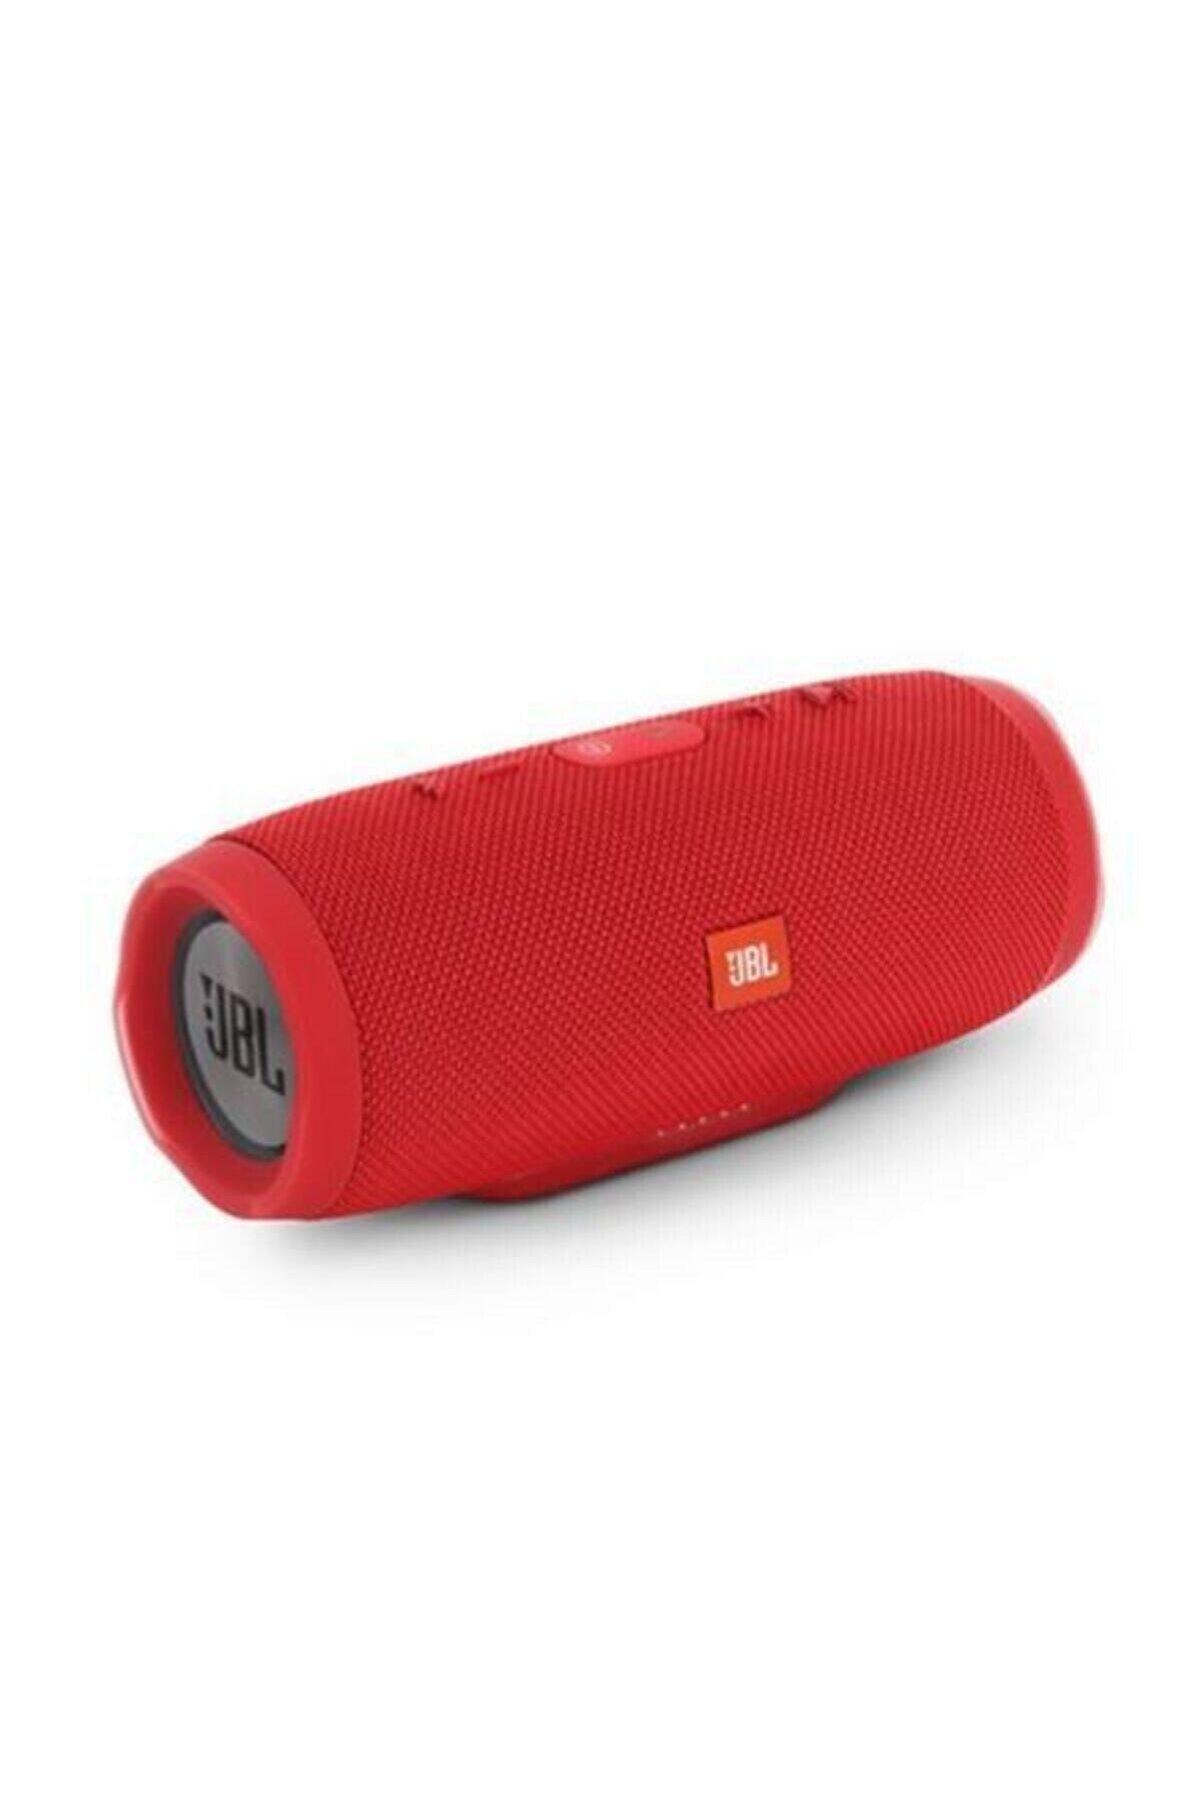 Gate Charge 4 Bluetooth Kablosuz Hoparlör Ses Bombası Jbl Benzeri